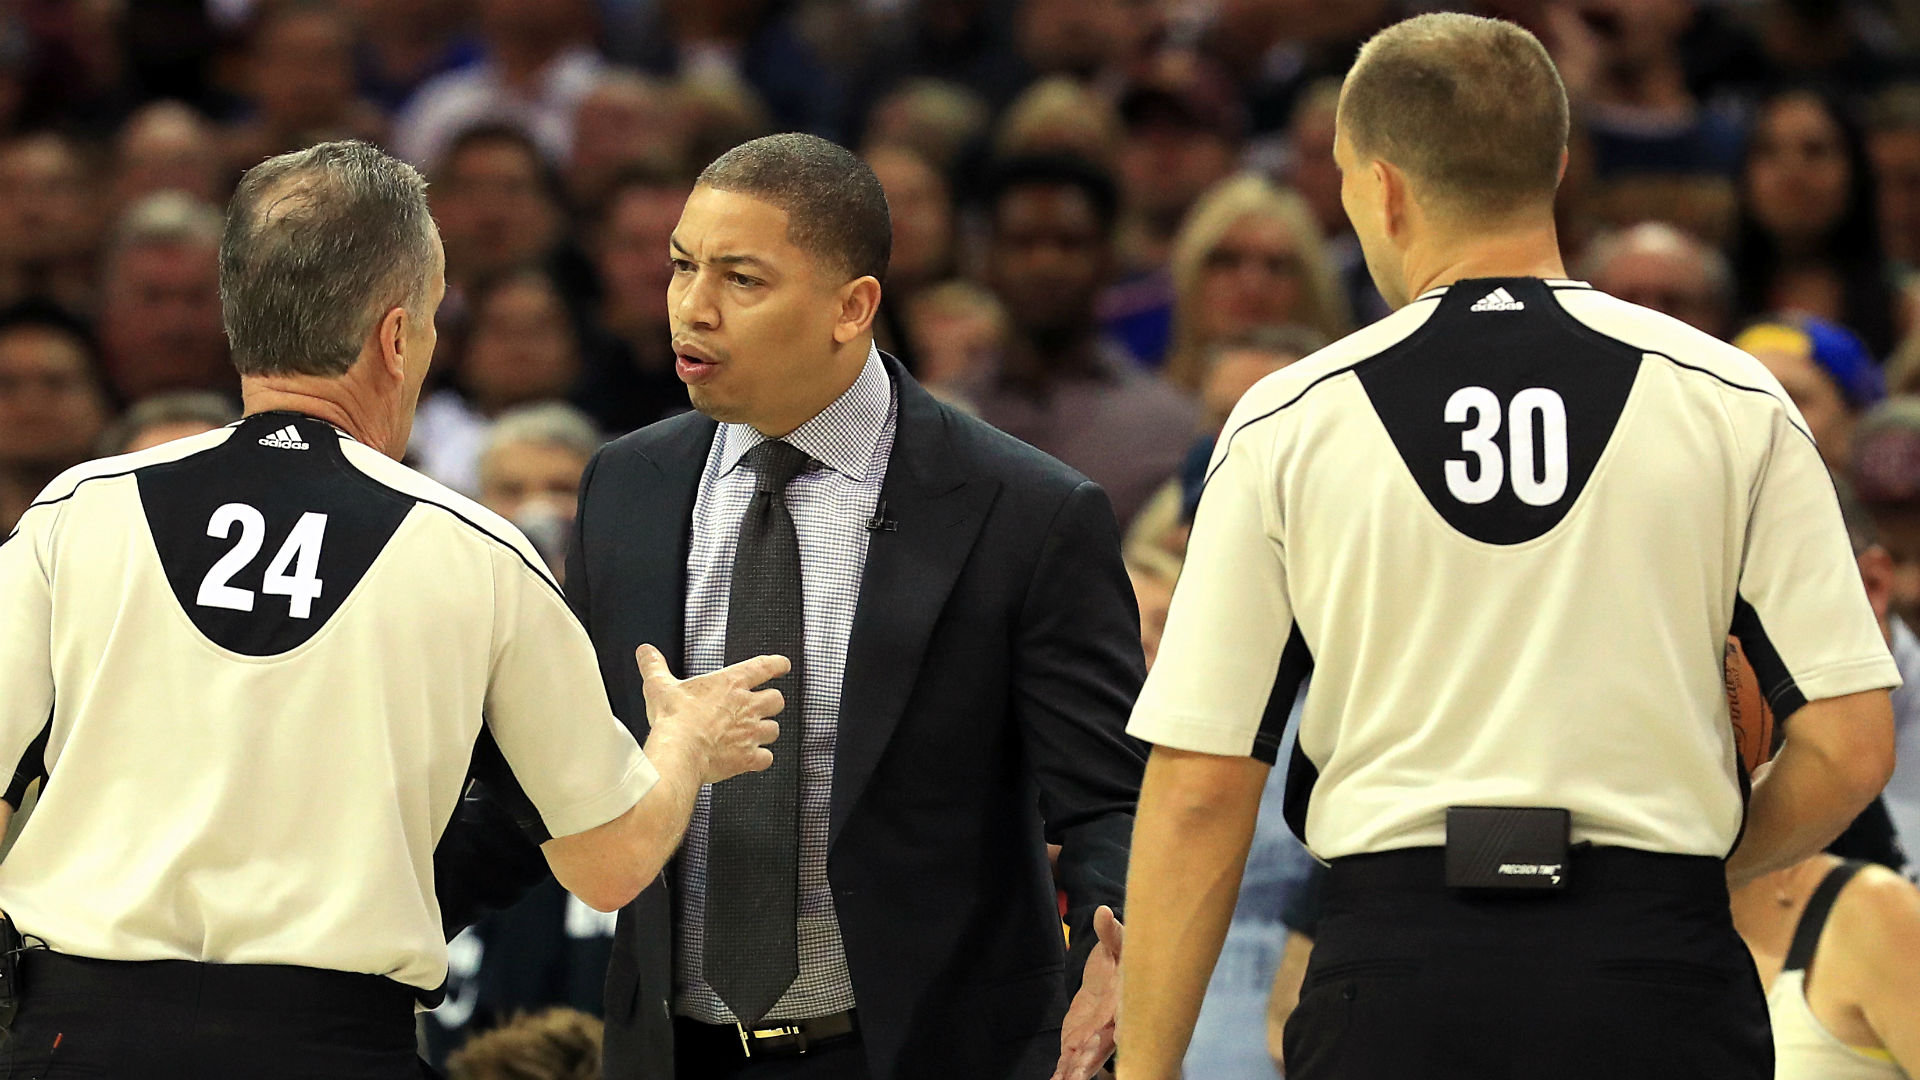 Cavs Halt Warriors Postseason Streak, Bring NBA Finals To 3-1